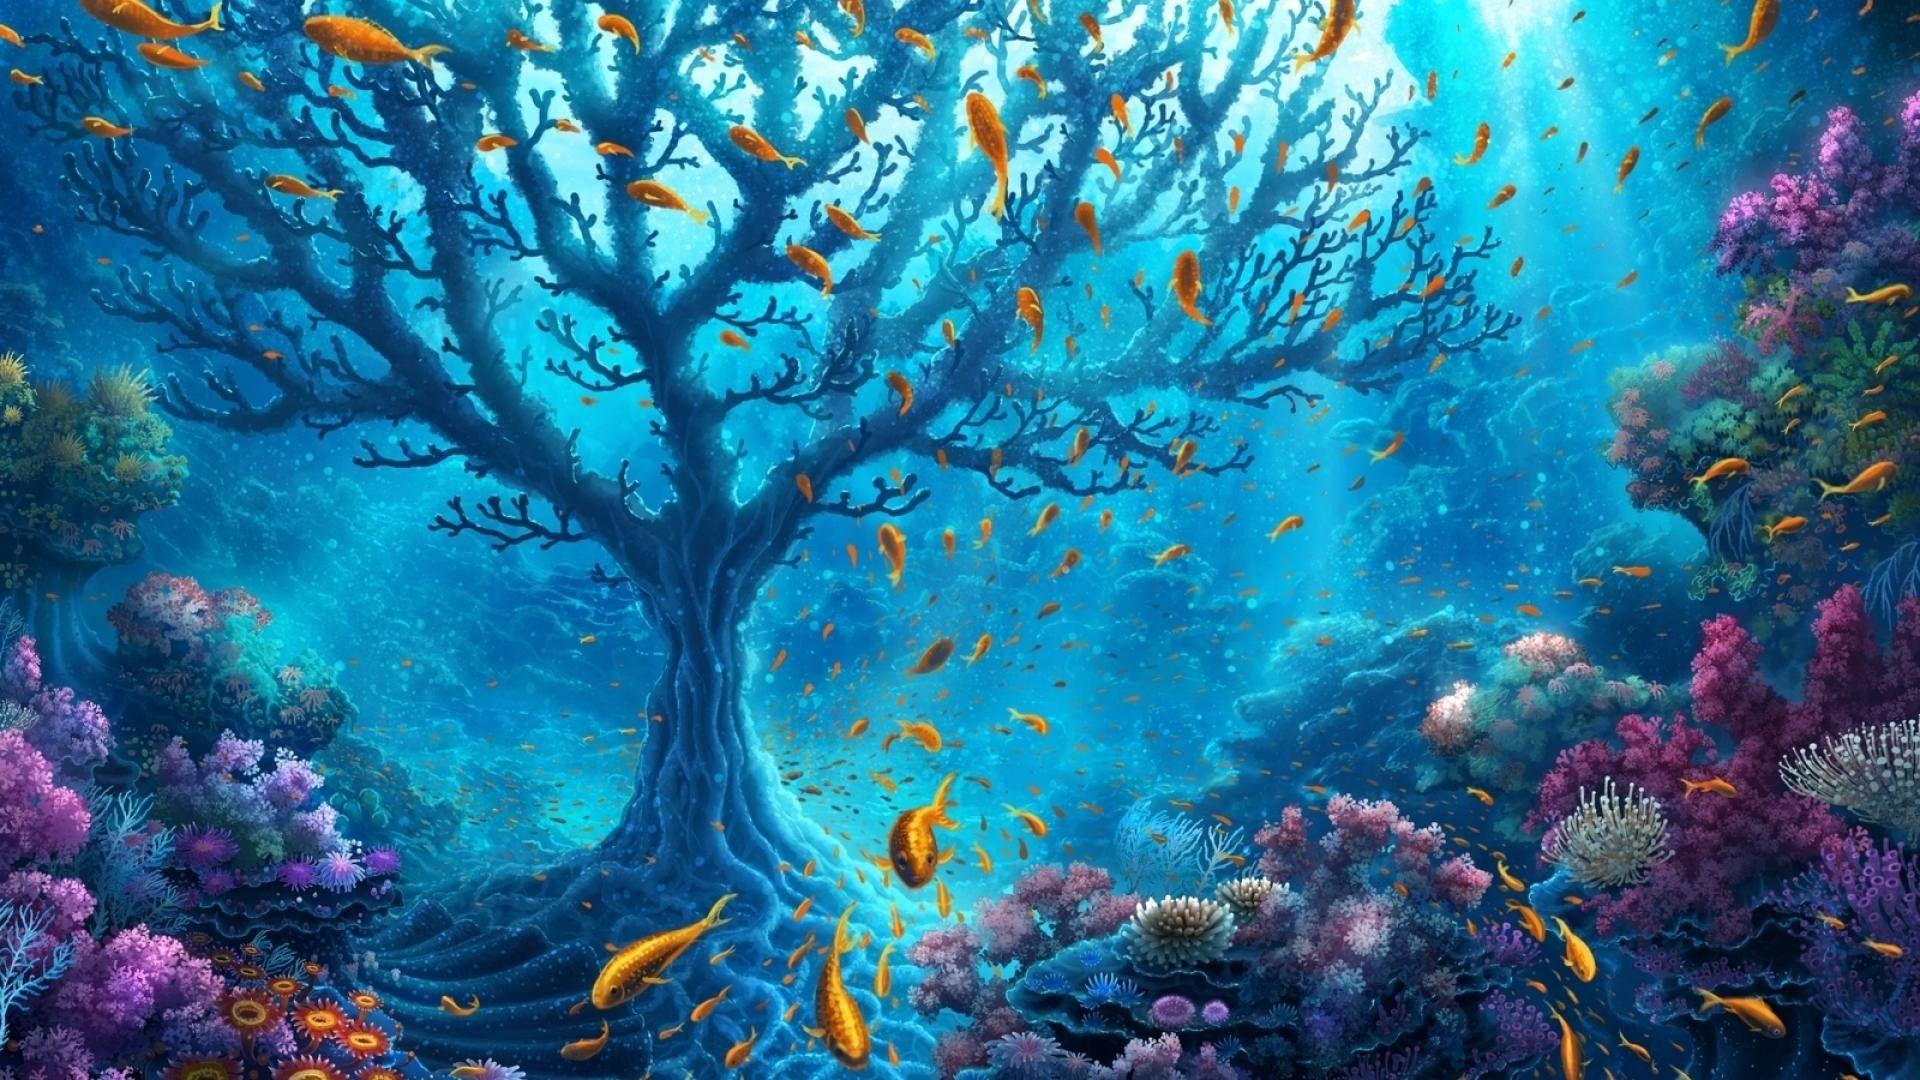 Underwater Desktop Wallpapers In 2020 Underwater Wallpaper Underwater Painting Fantasy Art Landscapes